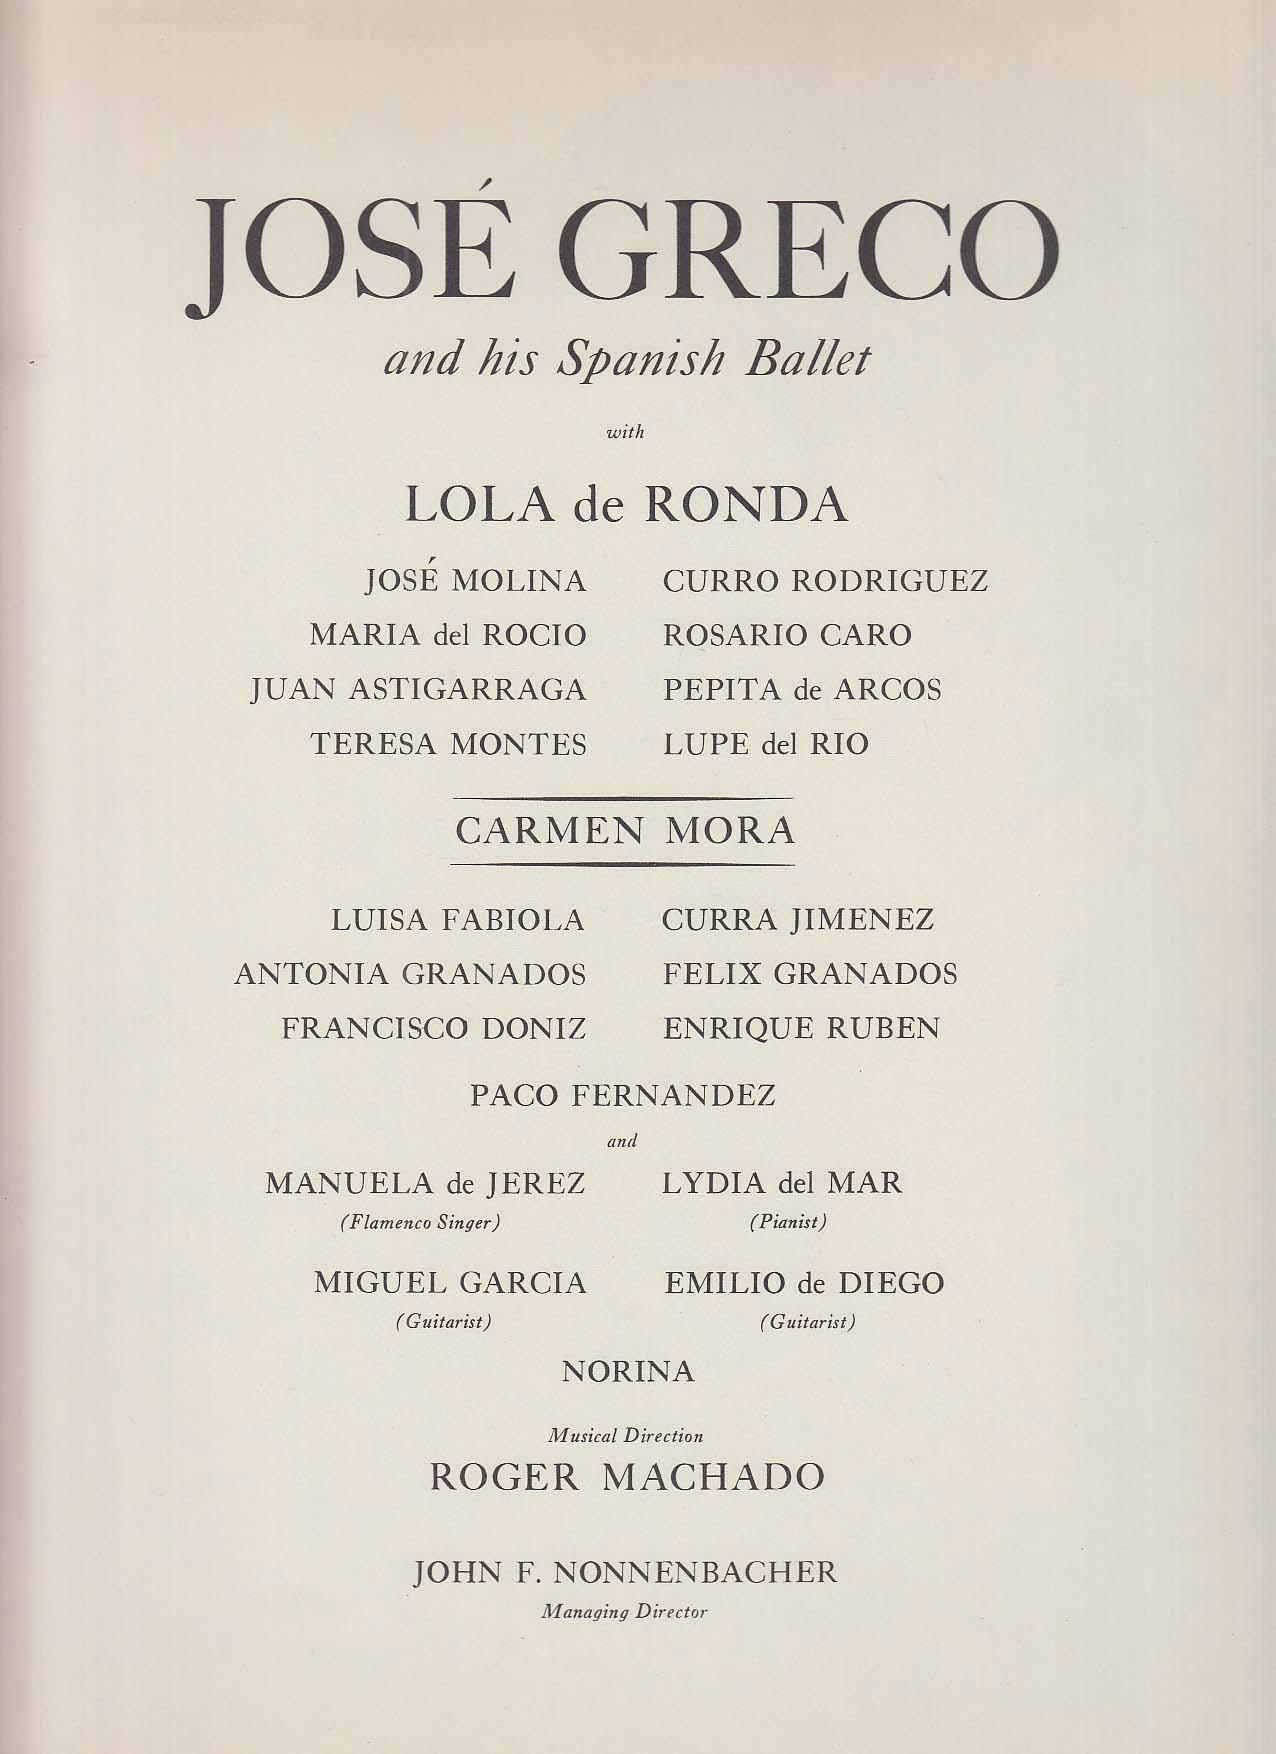 Image for Jose Greco & Spanish Ballet program 1960s